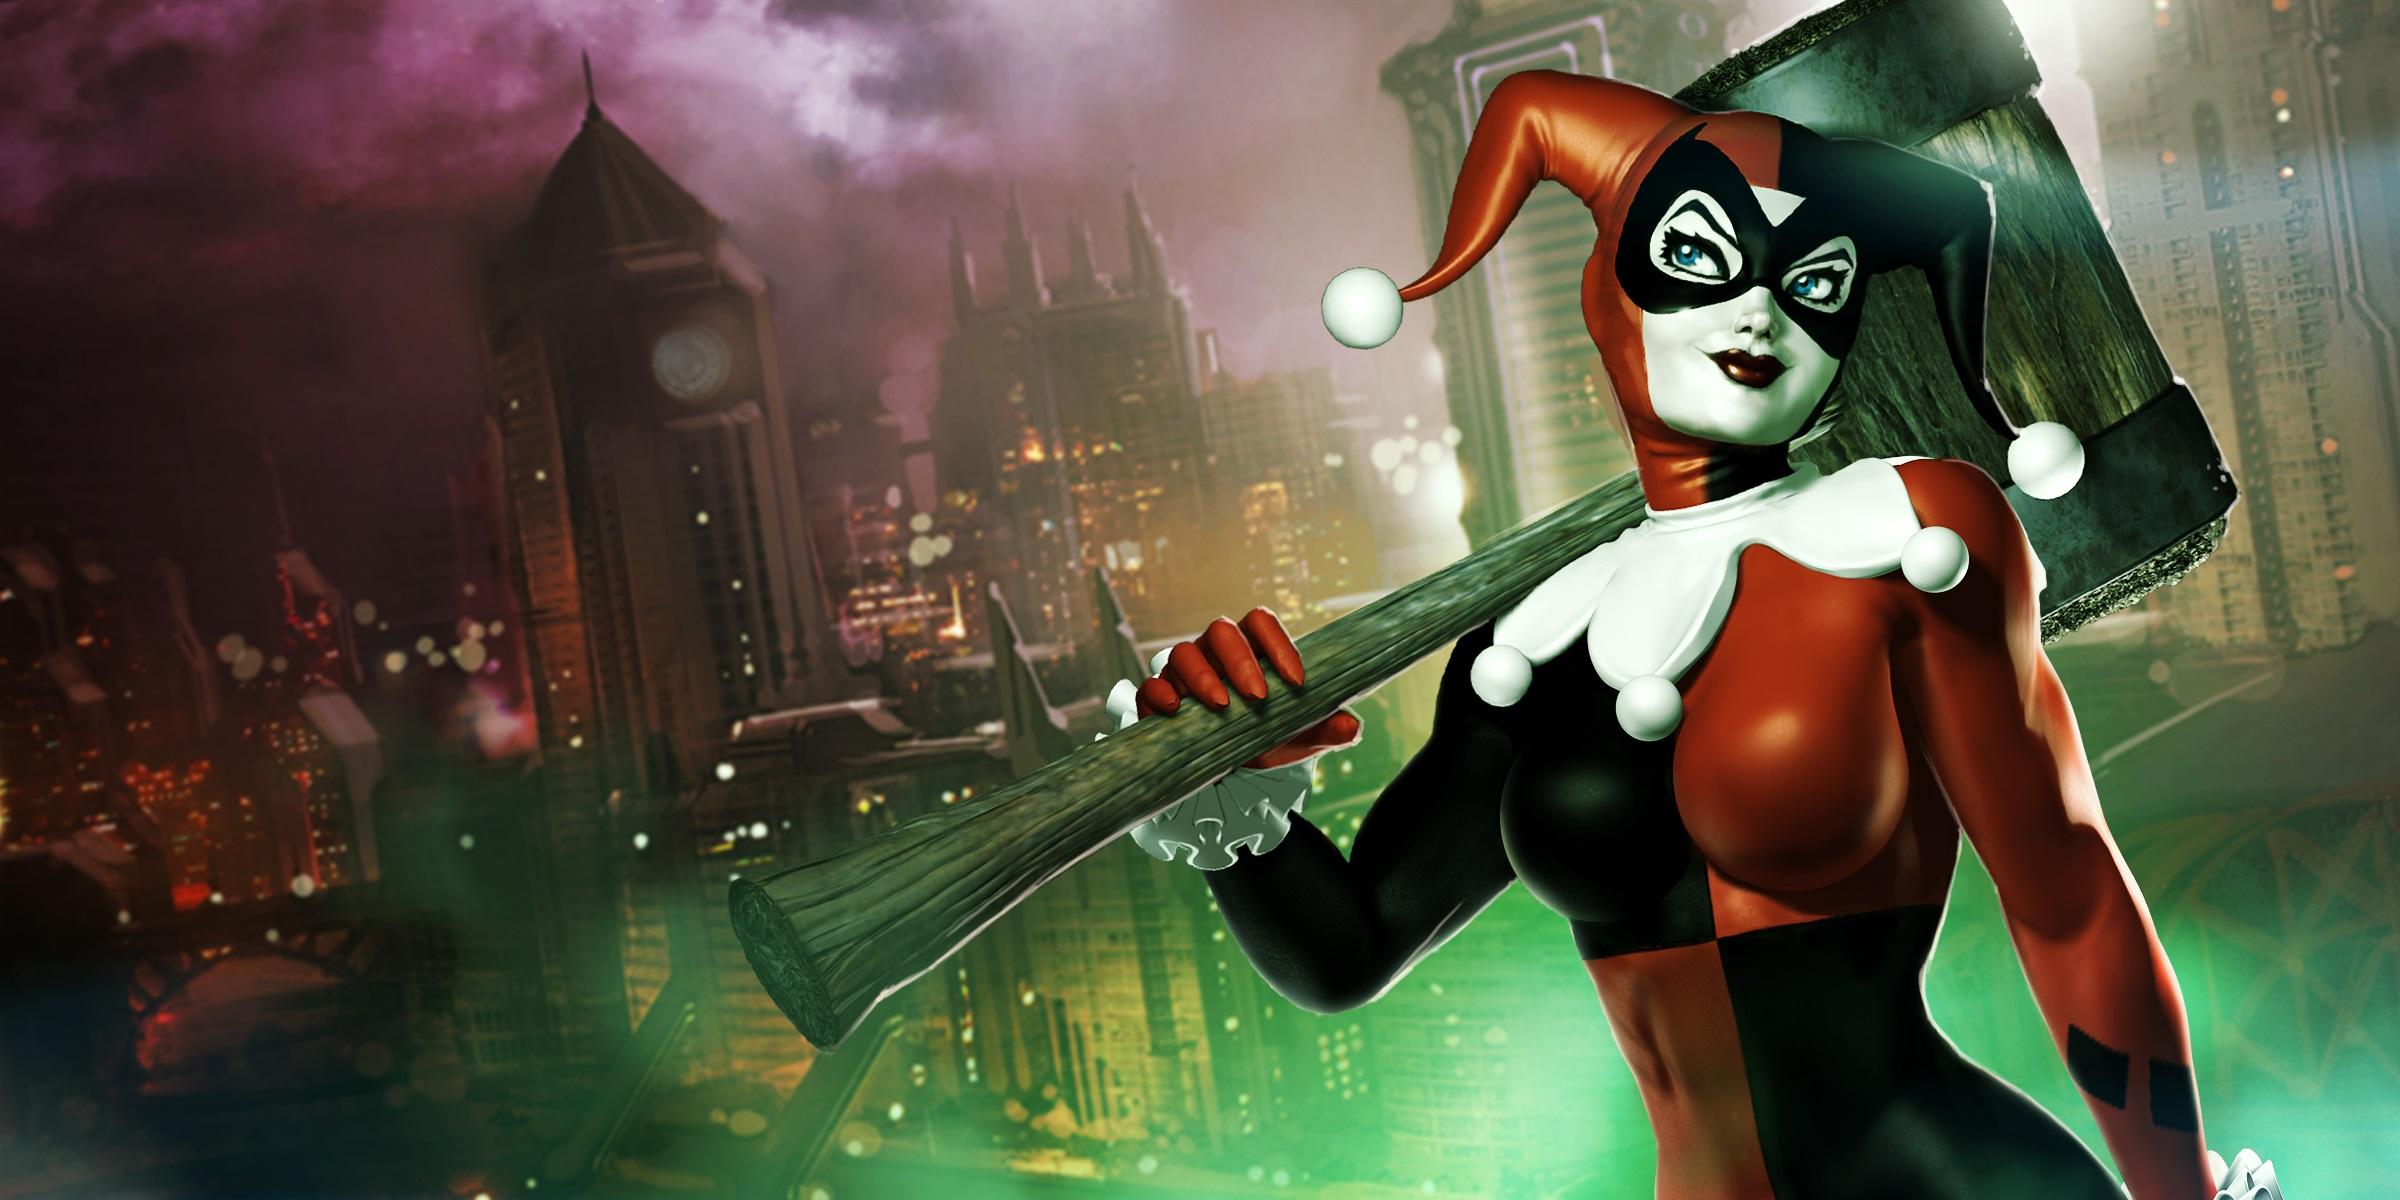 Harley Quinn Batman Arkham Knight Hd Games 4k Wallpapers Images